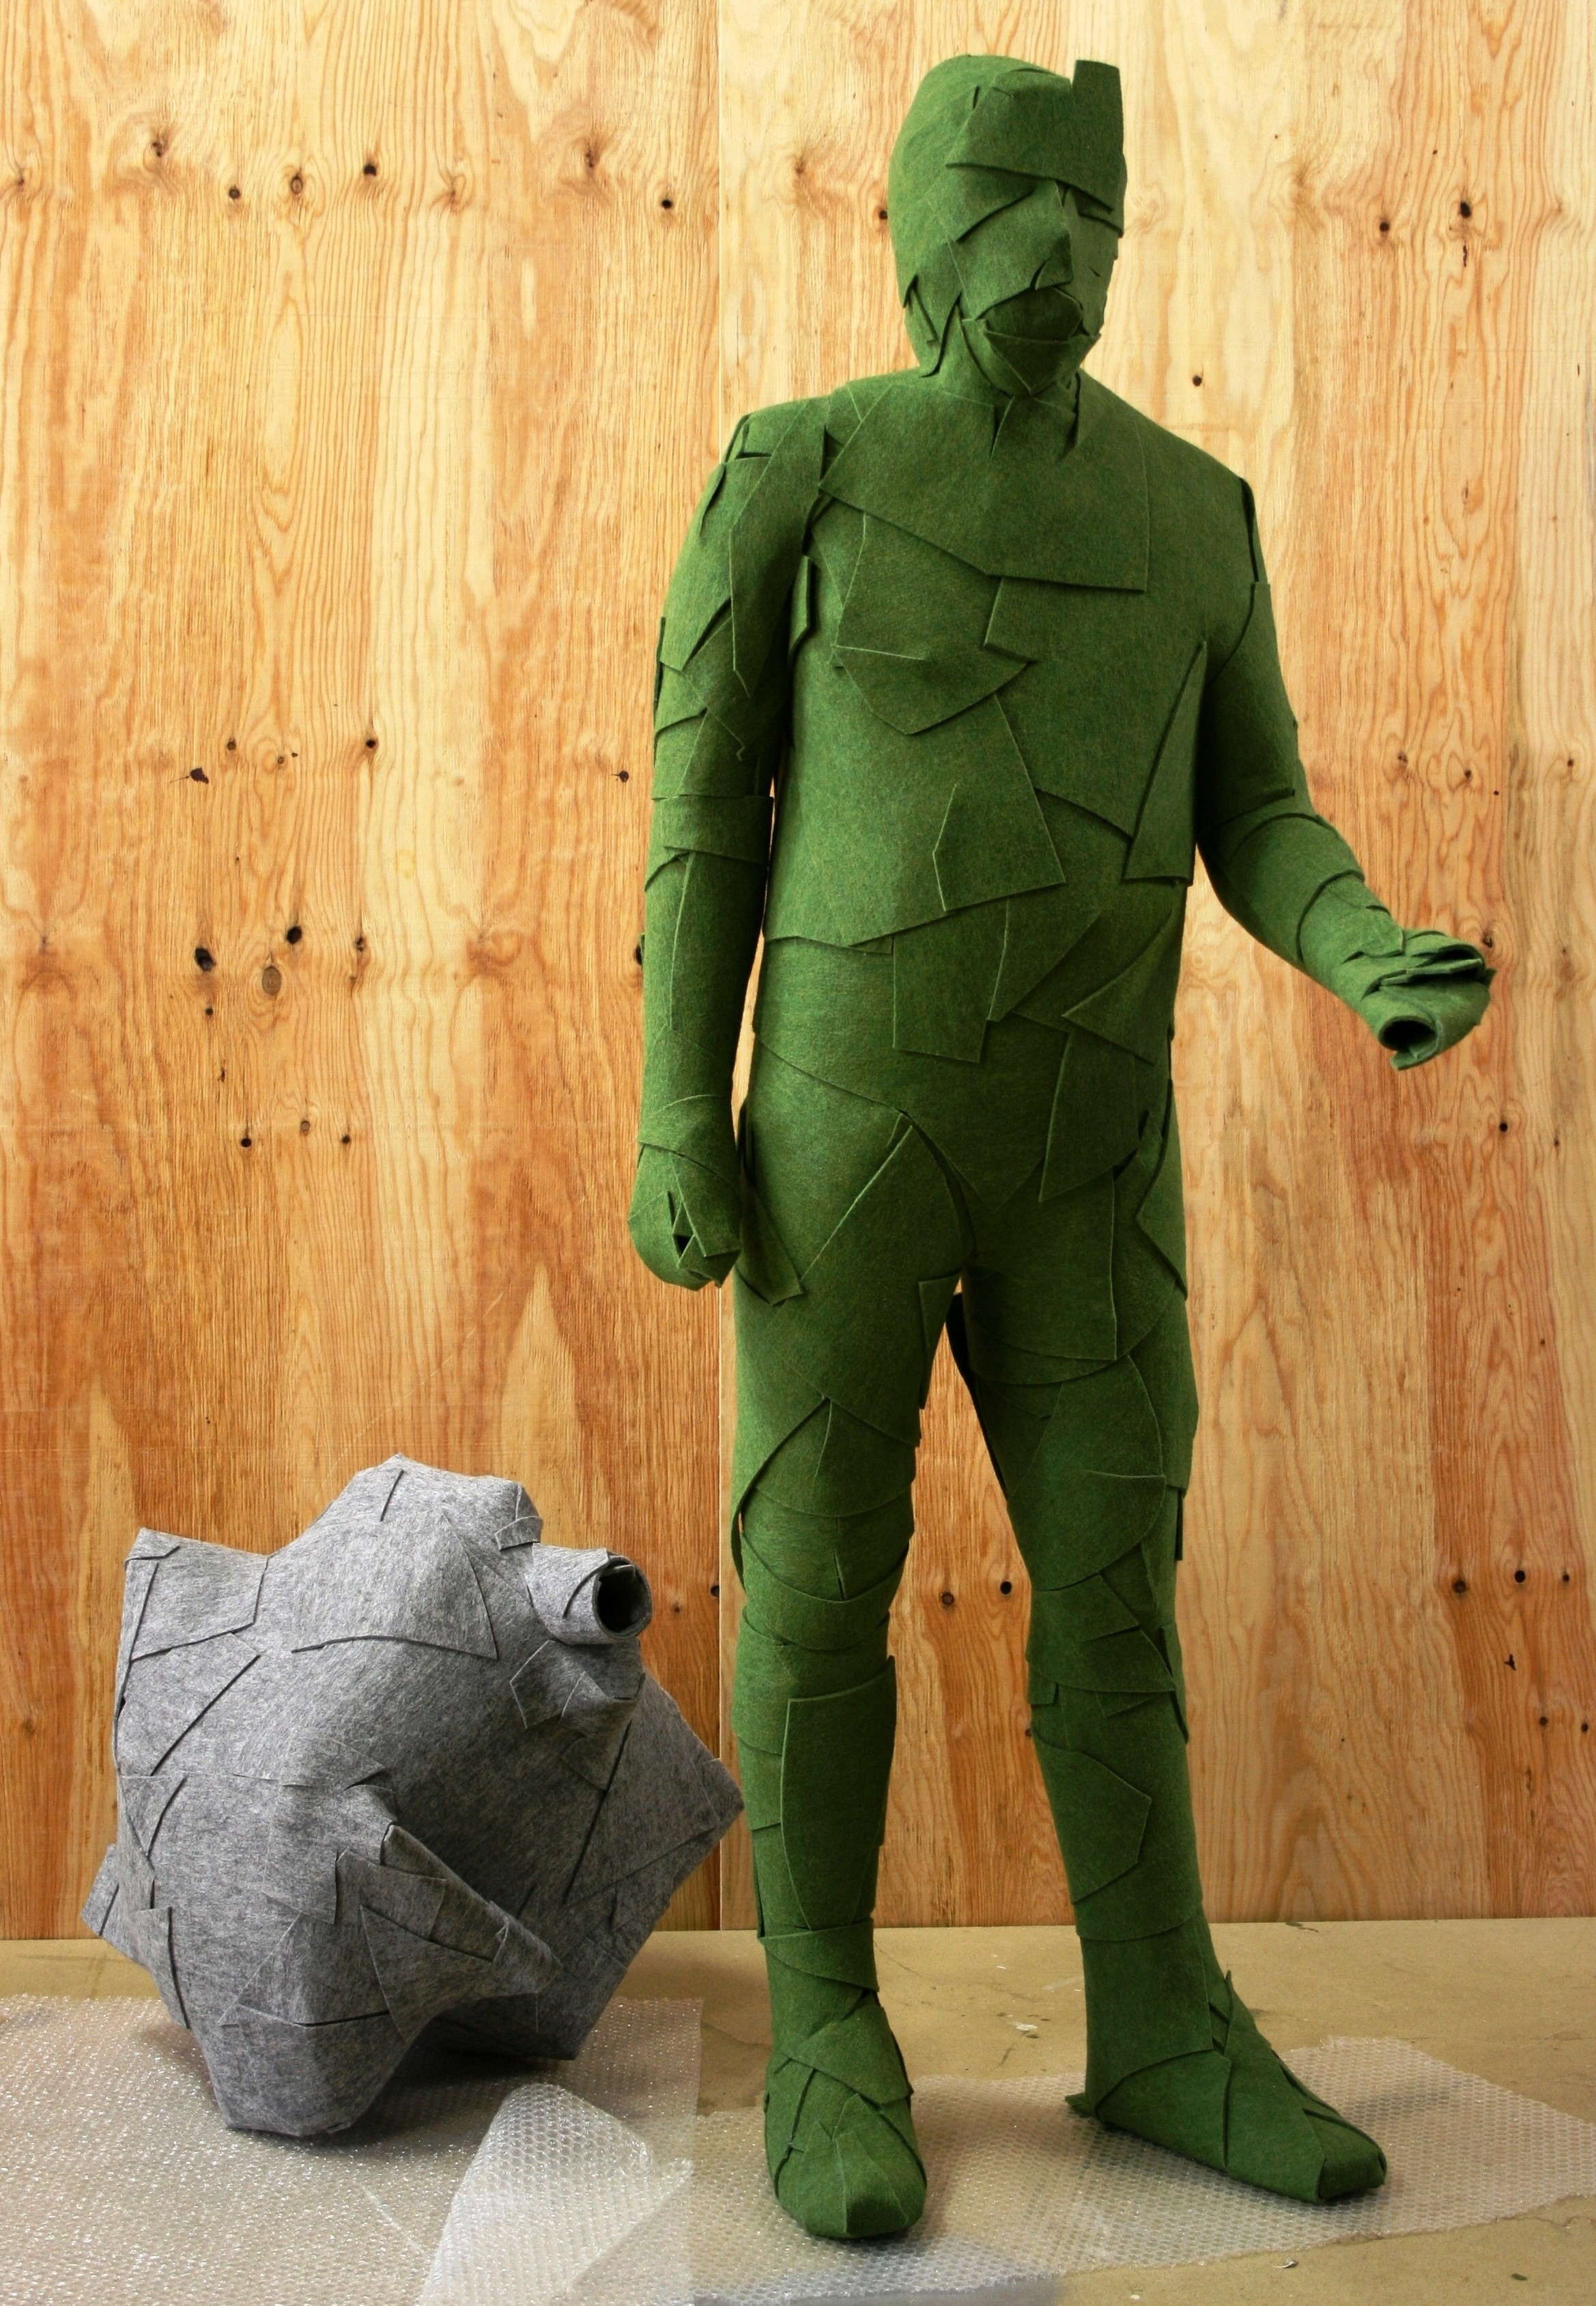 Marcus Geiger Filzskulptur grün